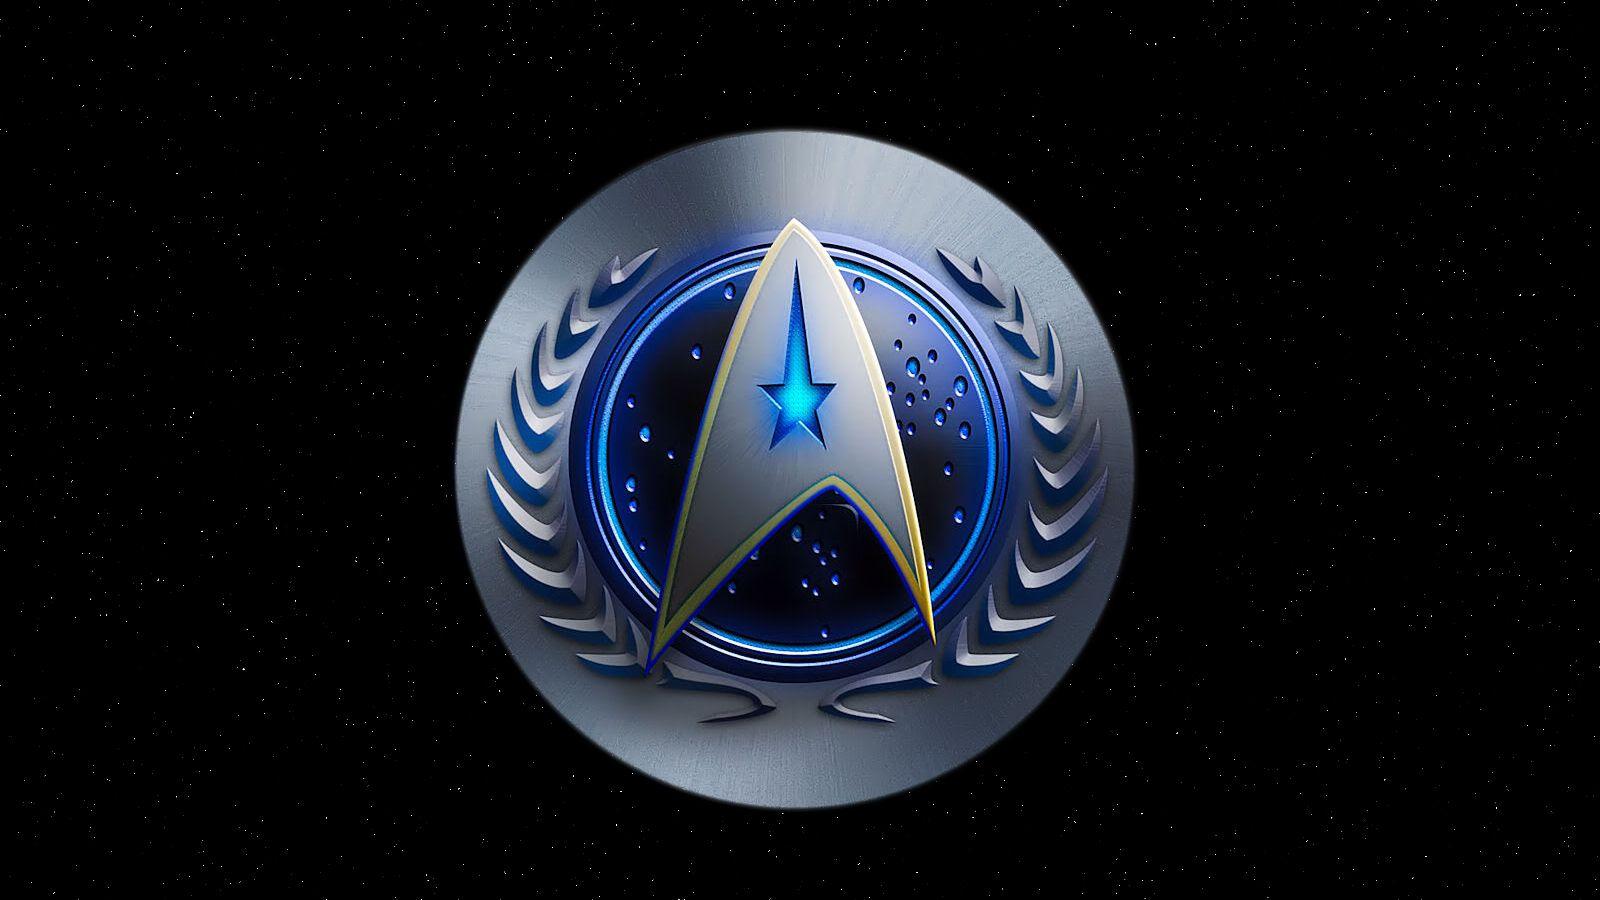 Star Trek Wallpaper Coders Wallpaper Abyss Everything Star Trek Sci Fi Star Trek 388084 Star Trek Wallpaper Star Trek Theme Star Trek